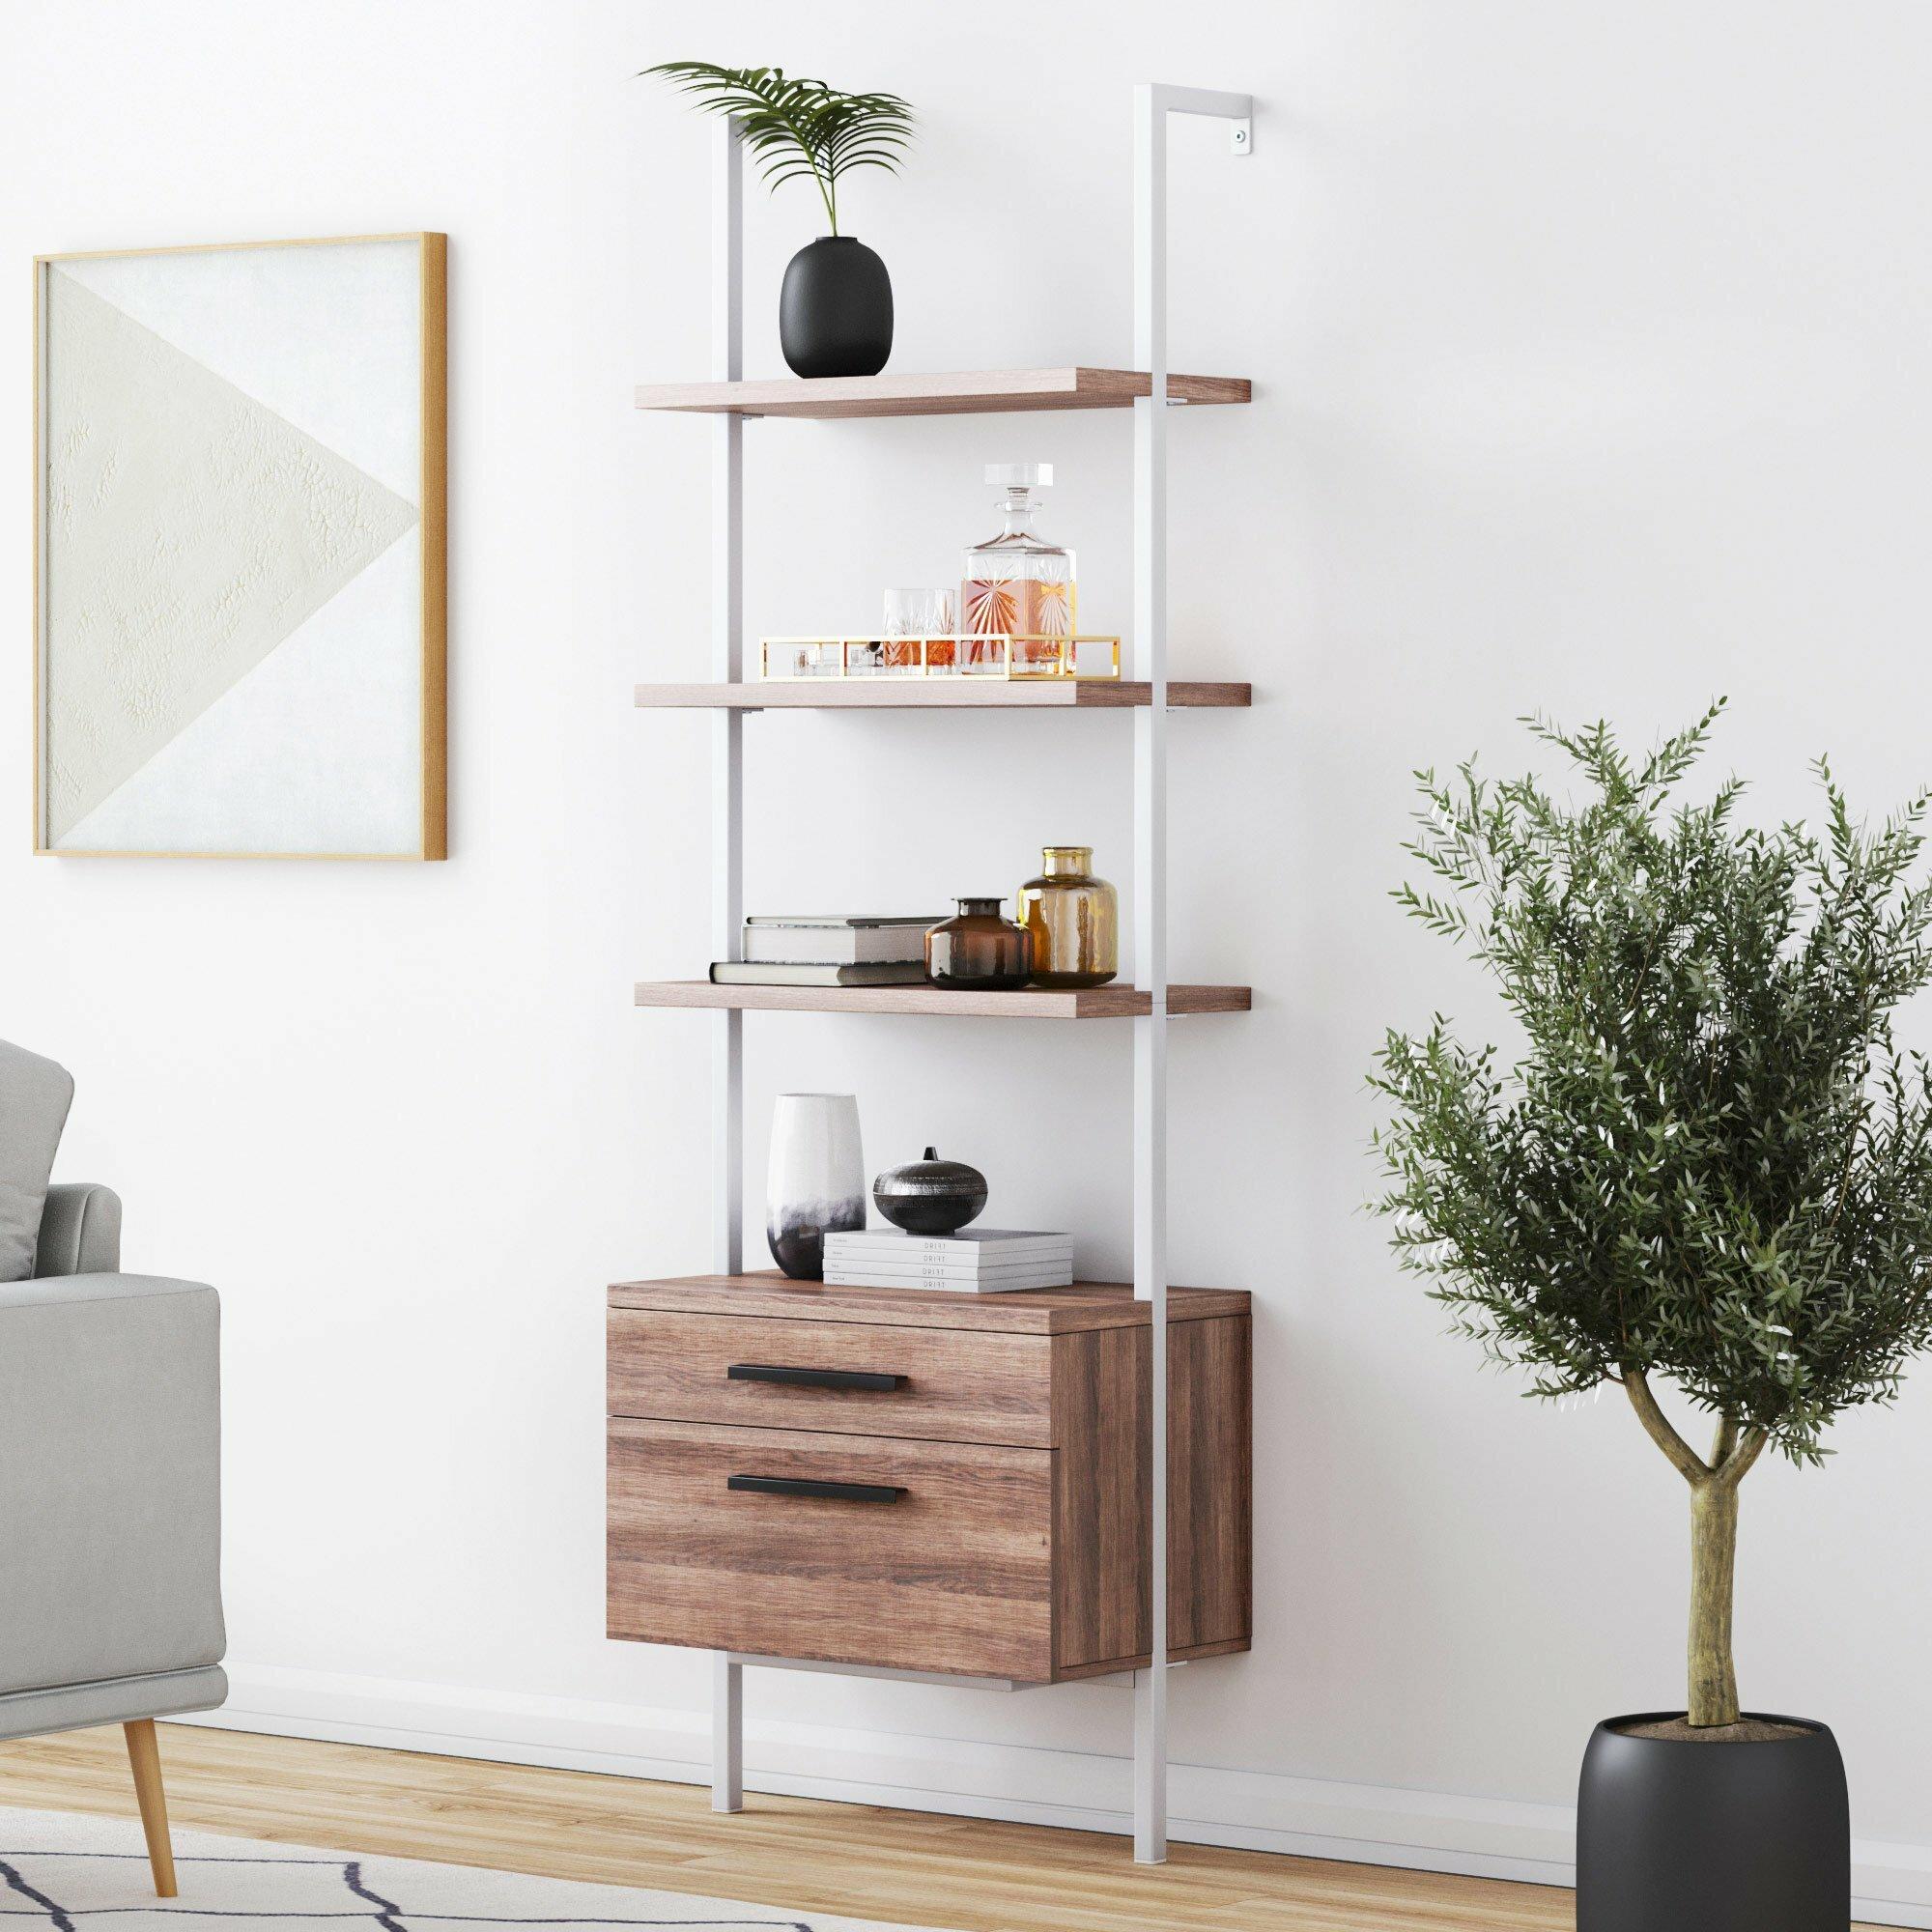 Bathroom Storage Ladder Shelves Bedroom Unit Wicker Baskets Rattan Shabby Chic